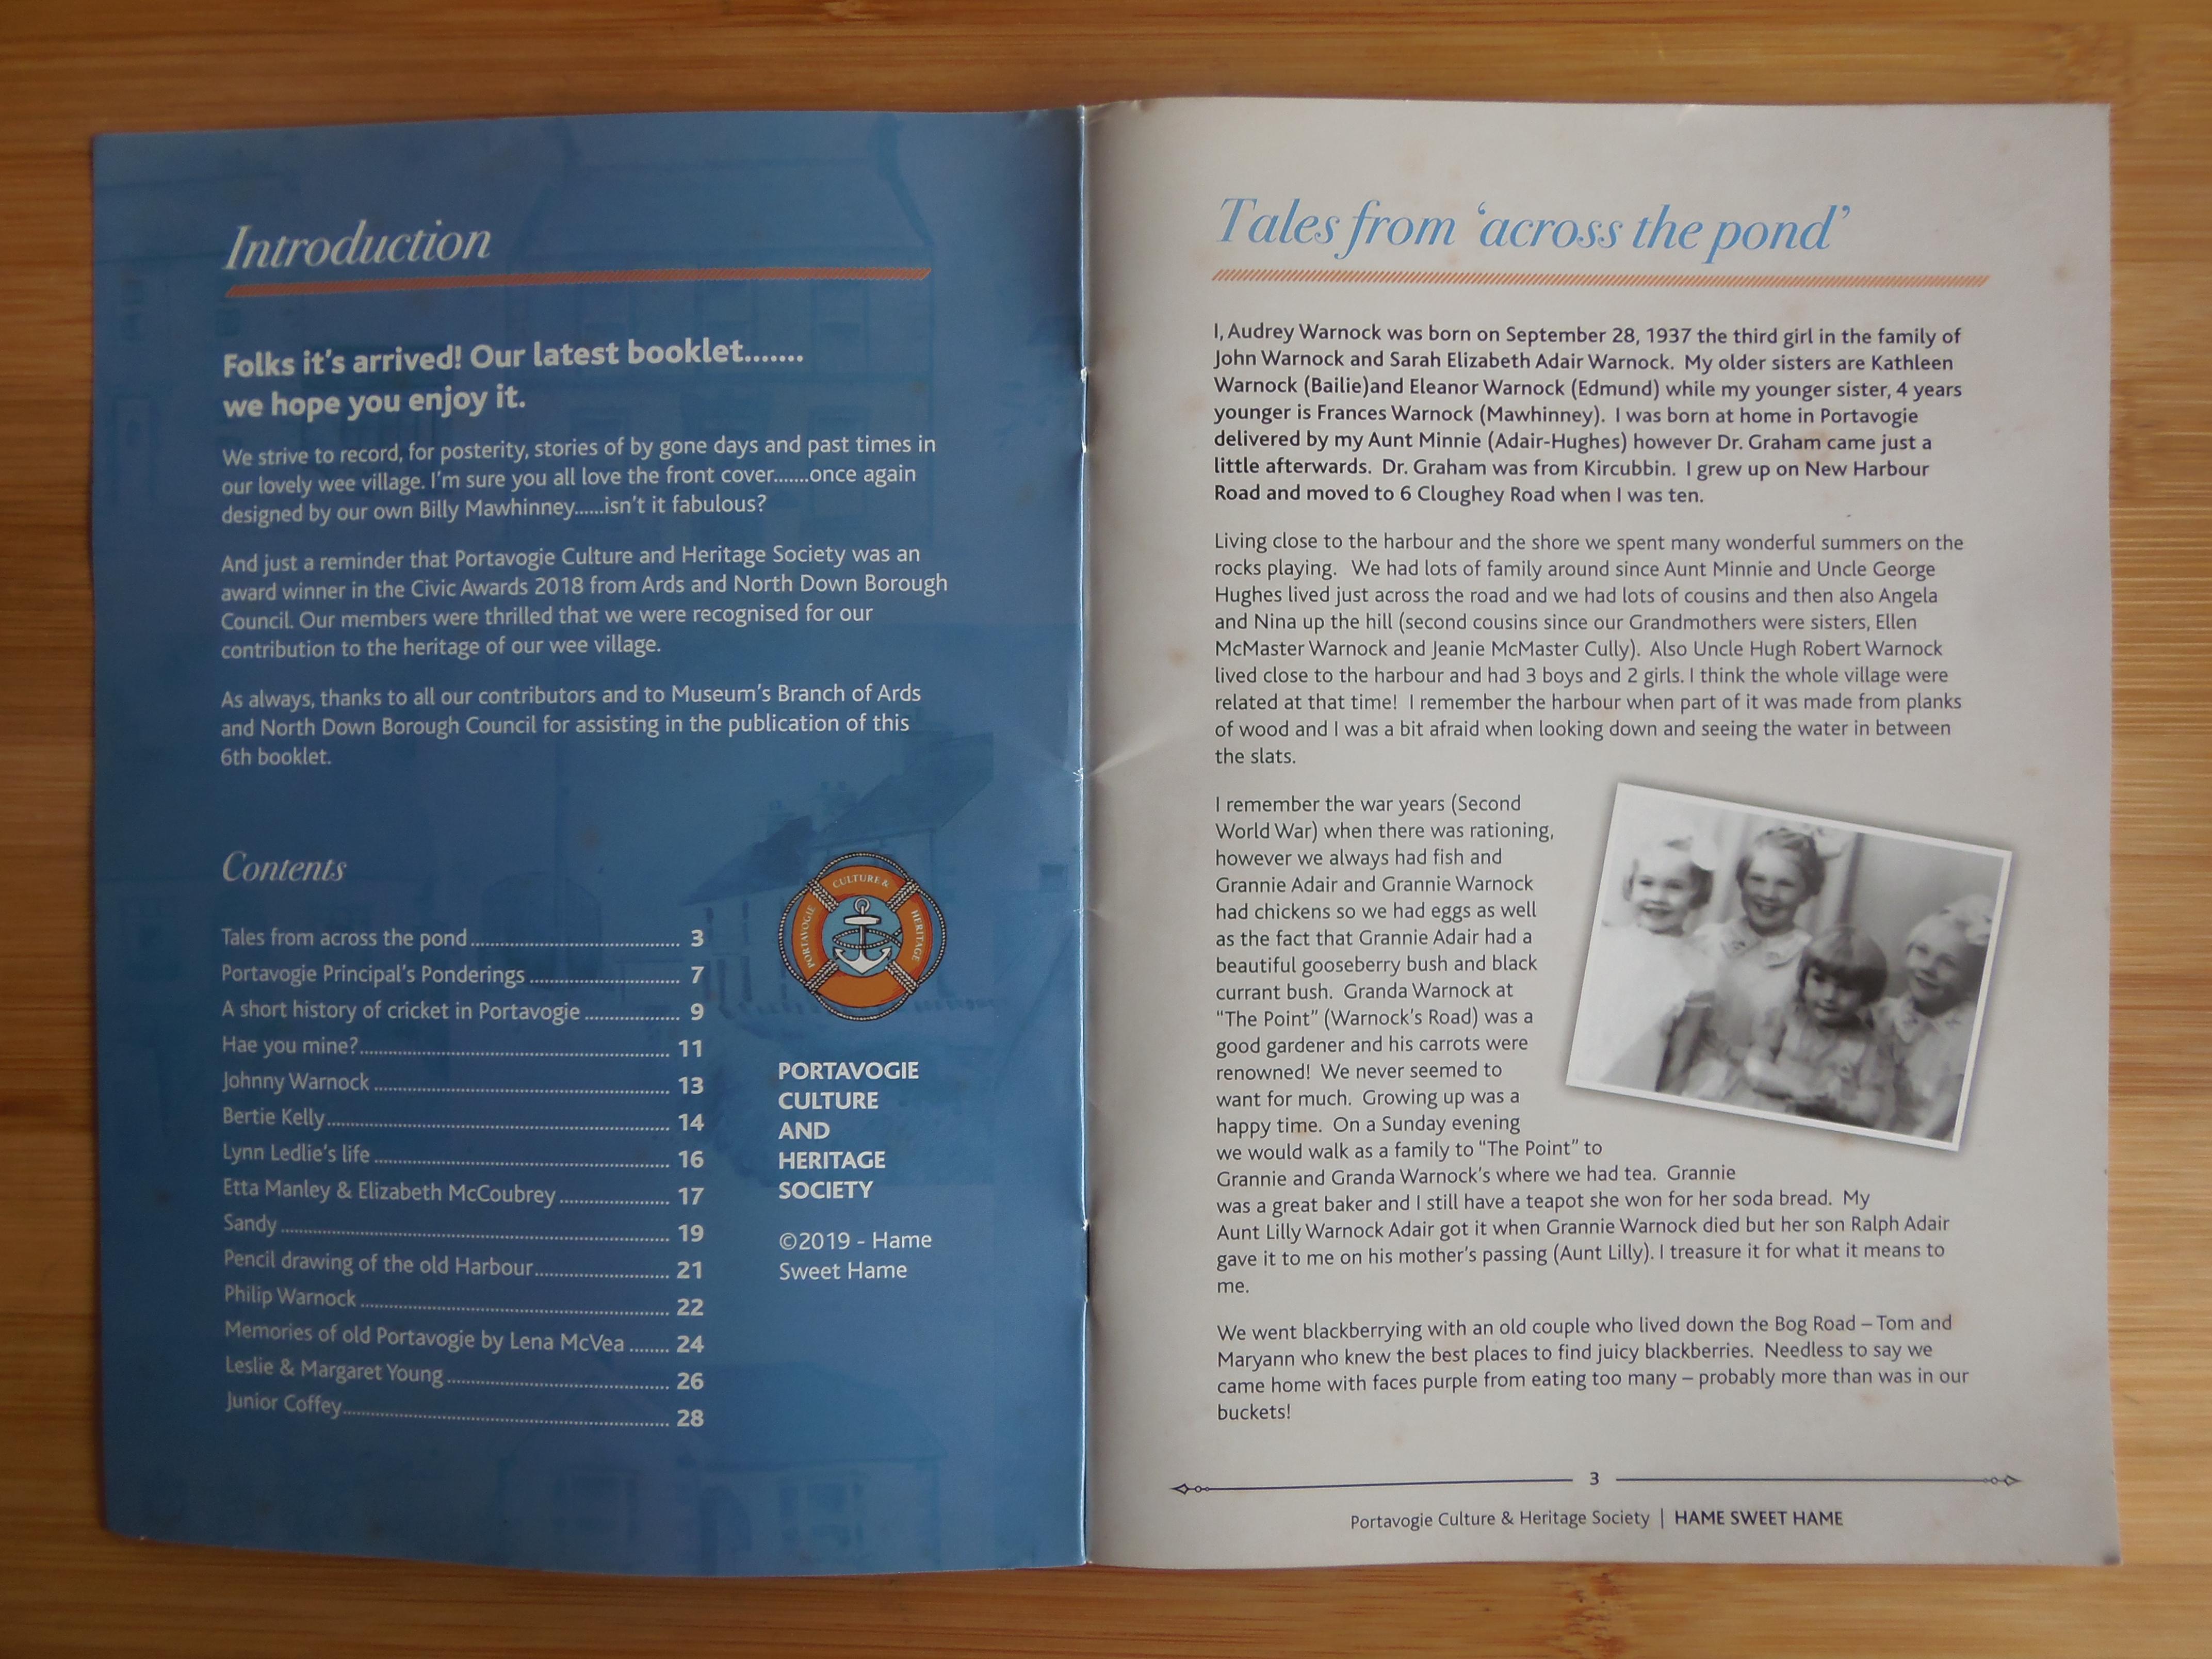 pg 2-3